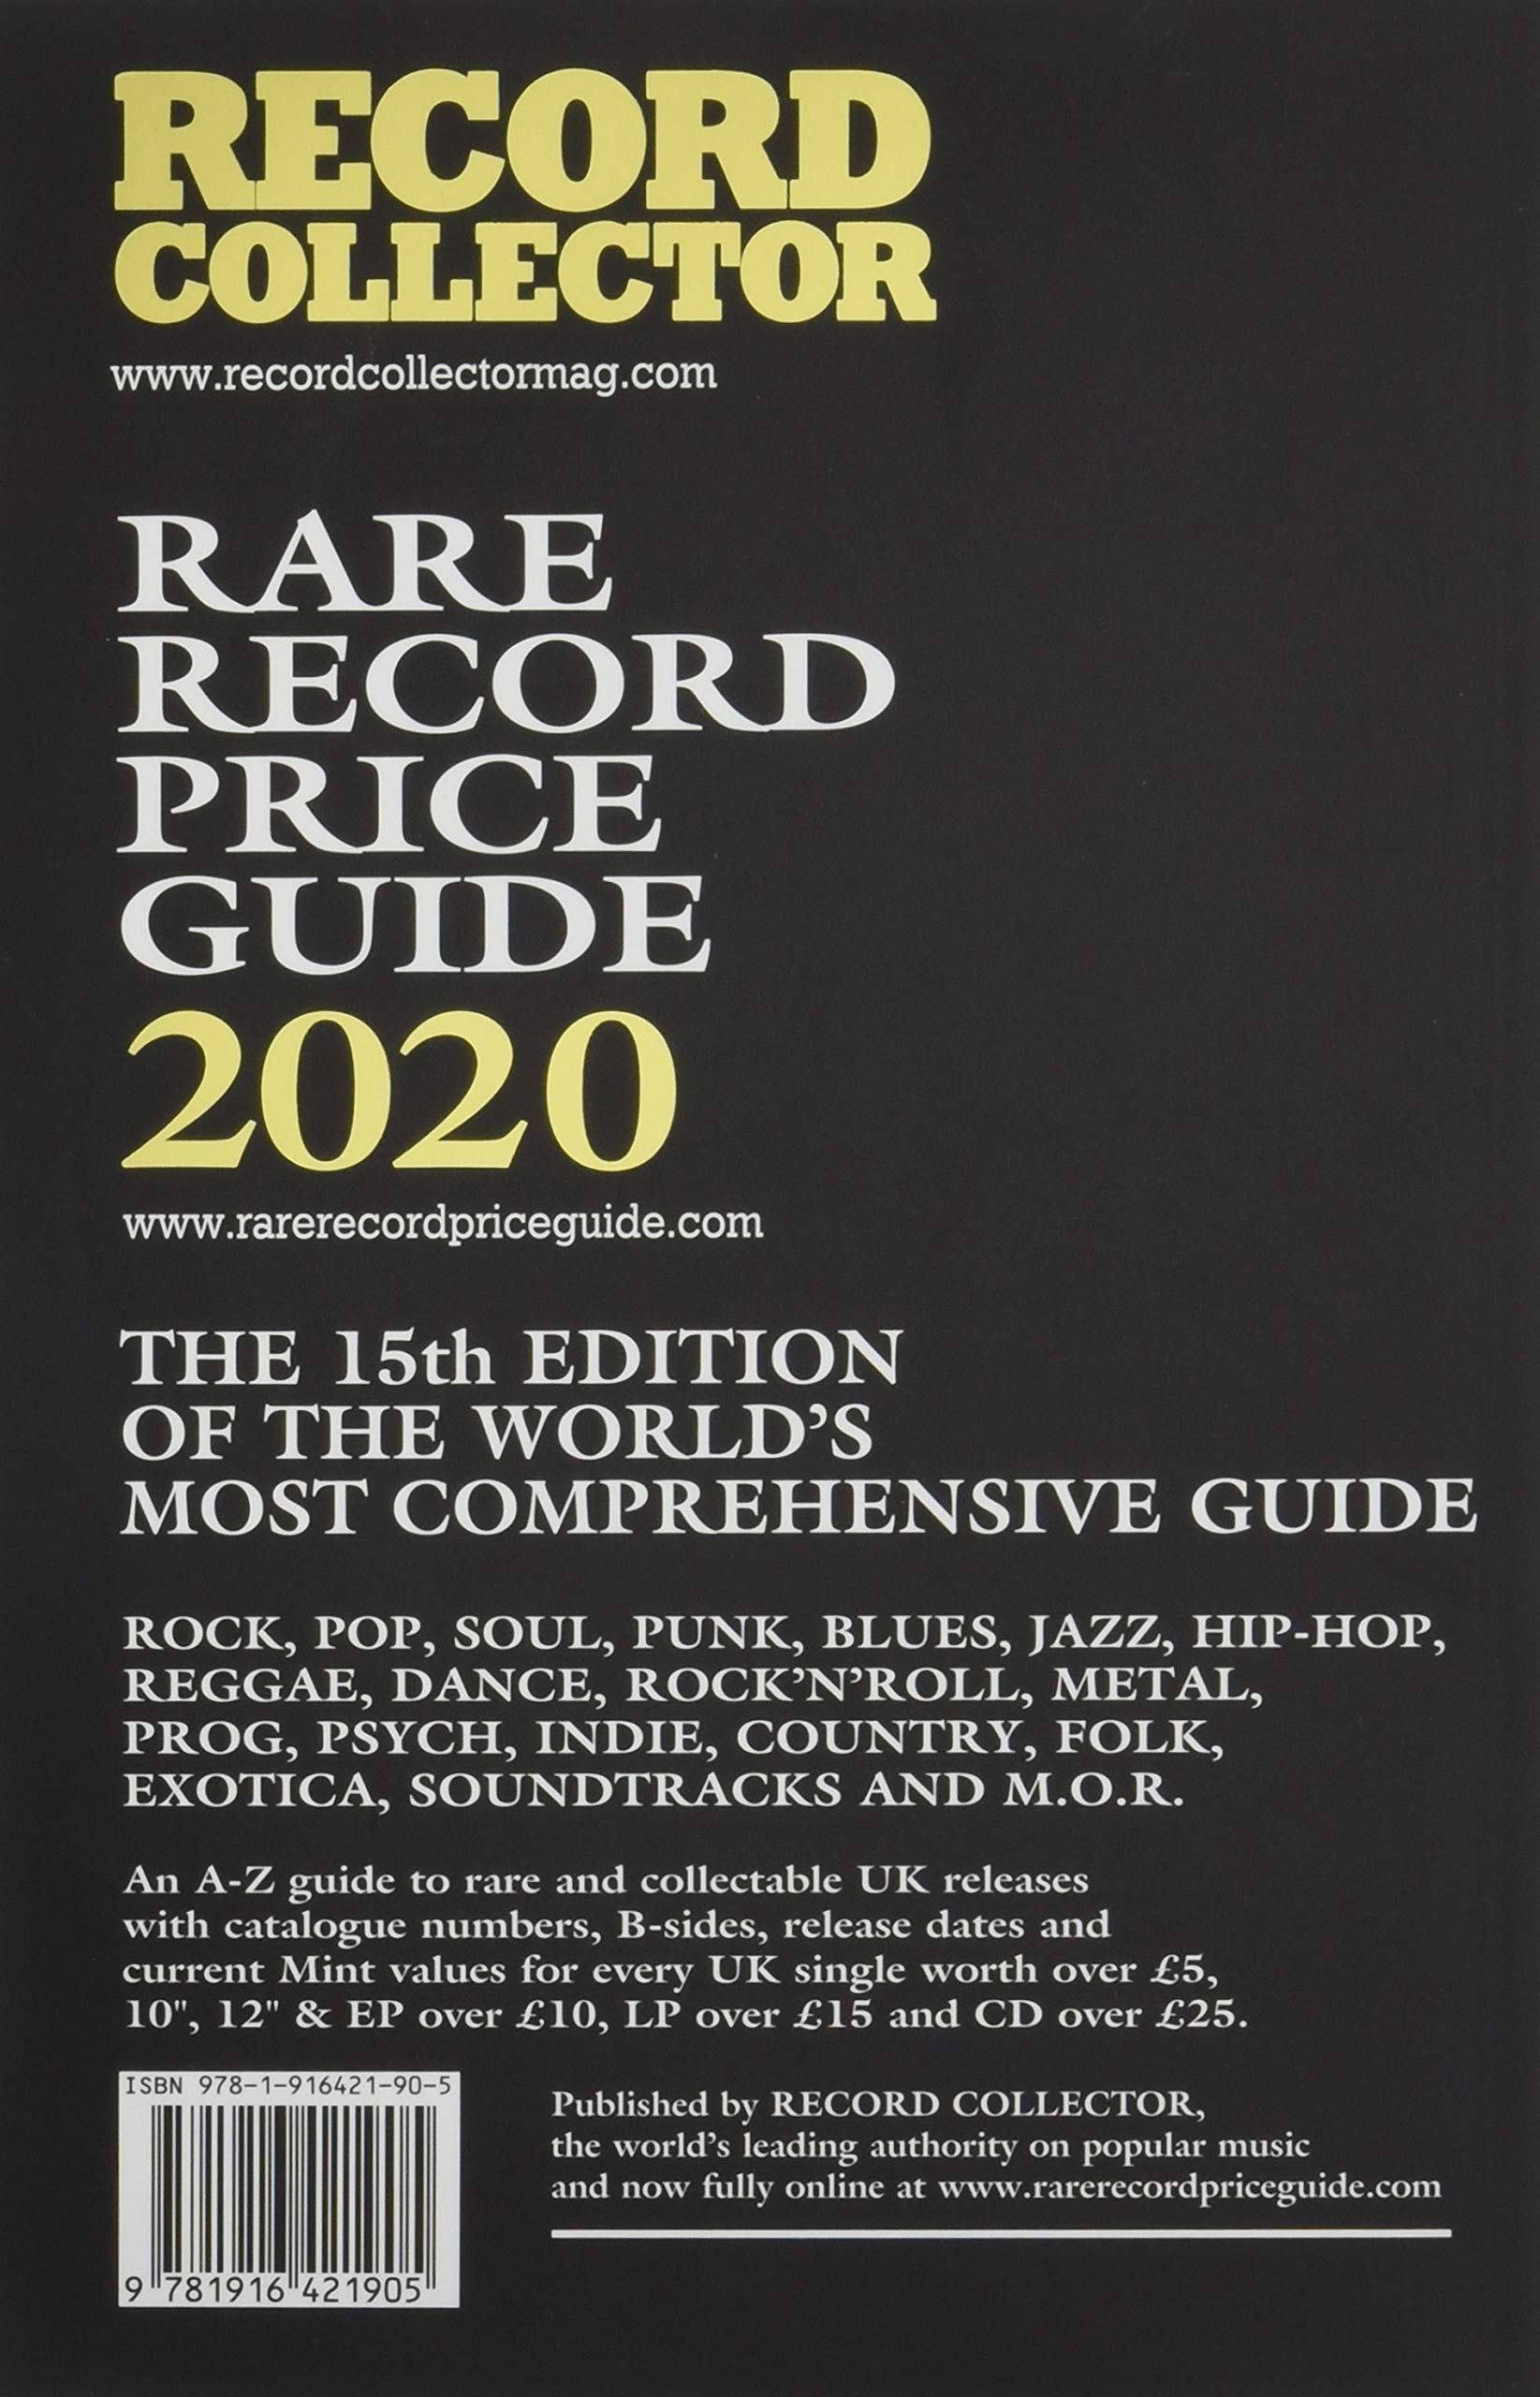 Rare Record Price Guide 2020: Amazon co uk: Ian Shirley